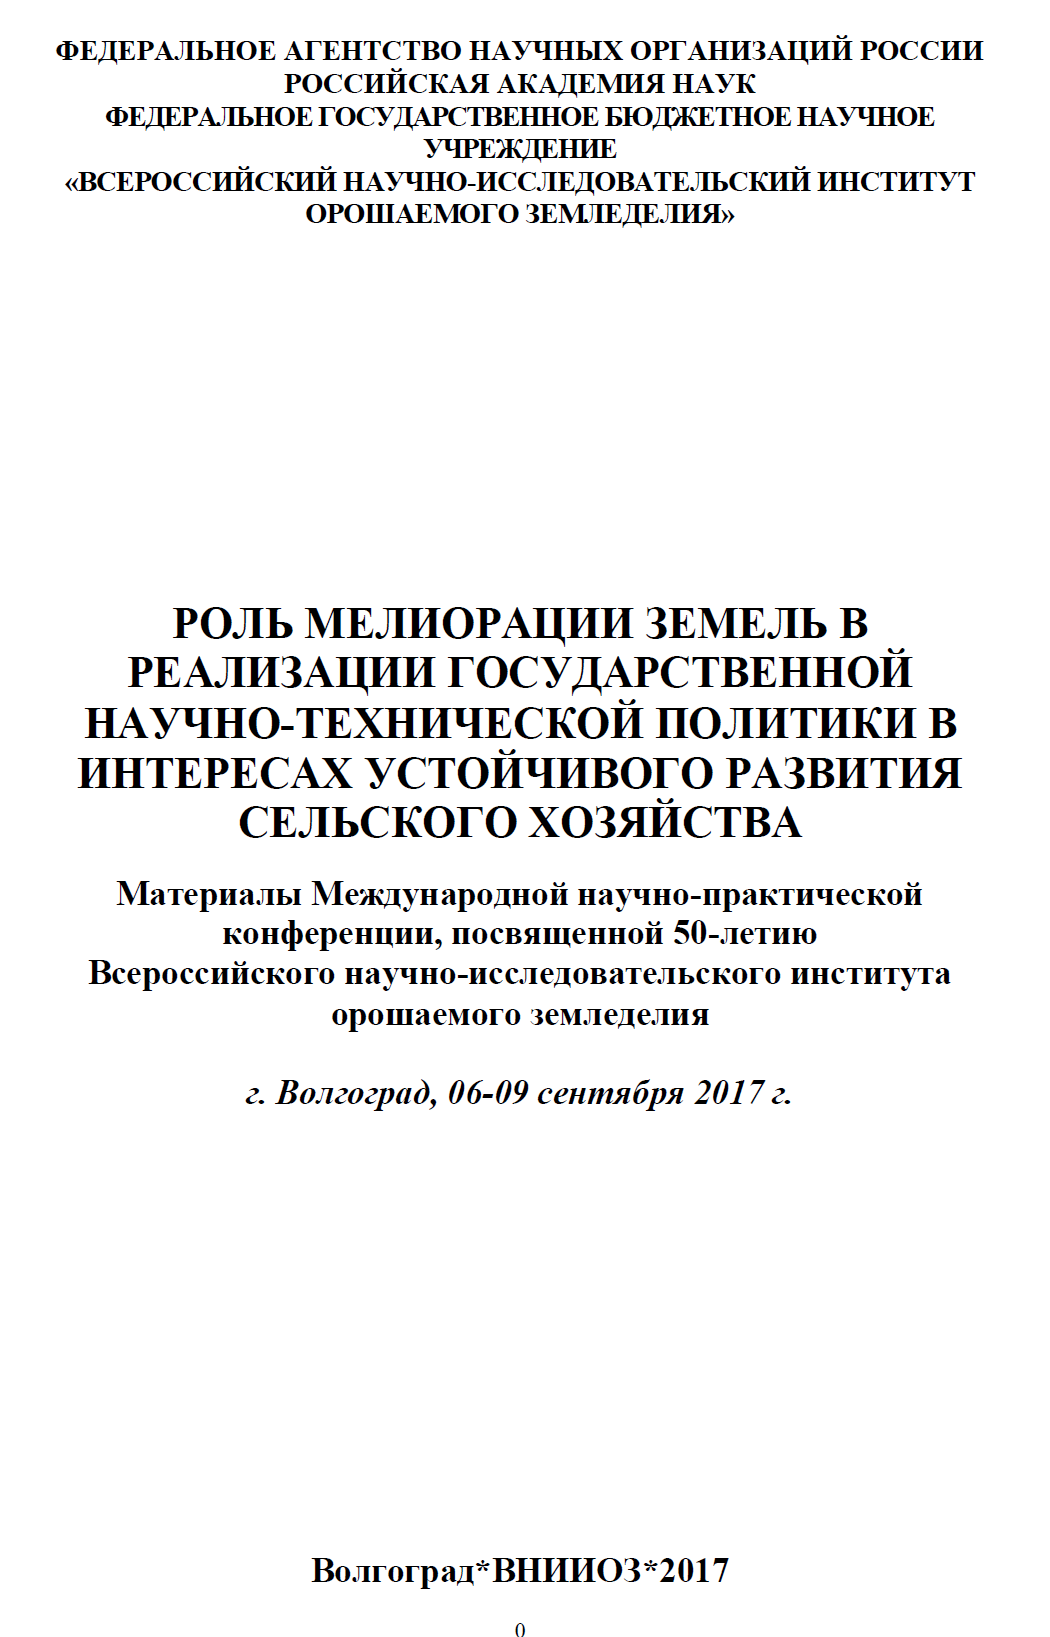 Сборник ВНИИОЗ 2017 обл